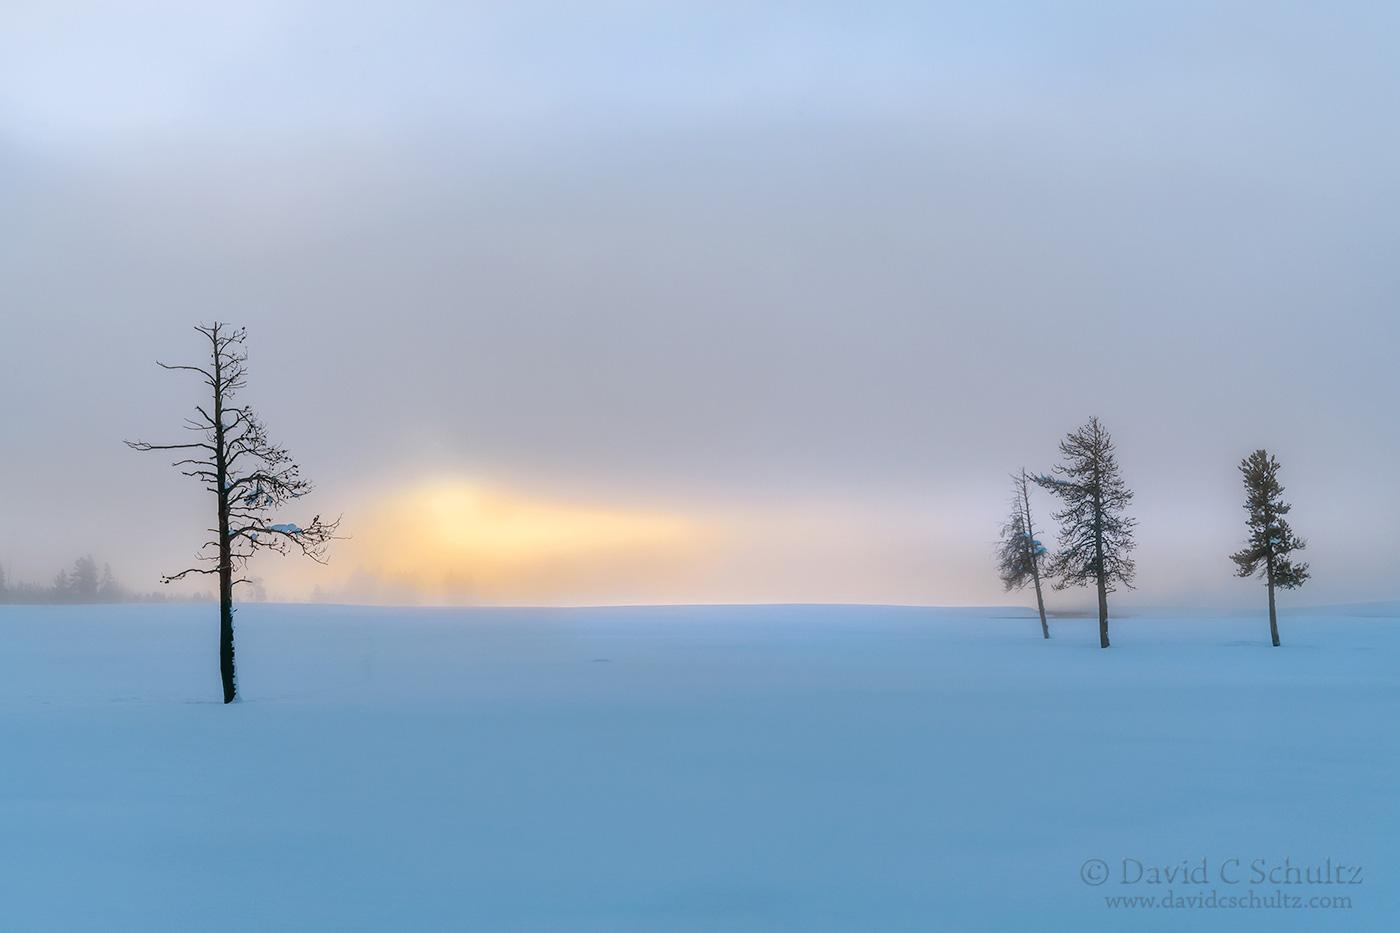 Sunrise in Yellowstone - Image #106-4403